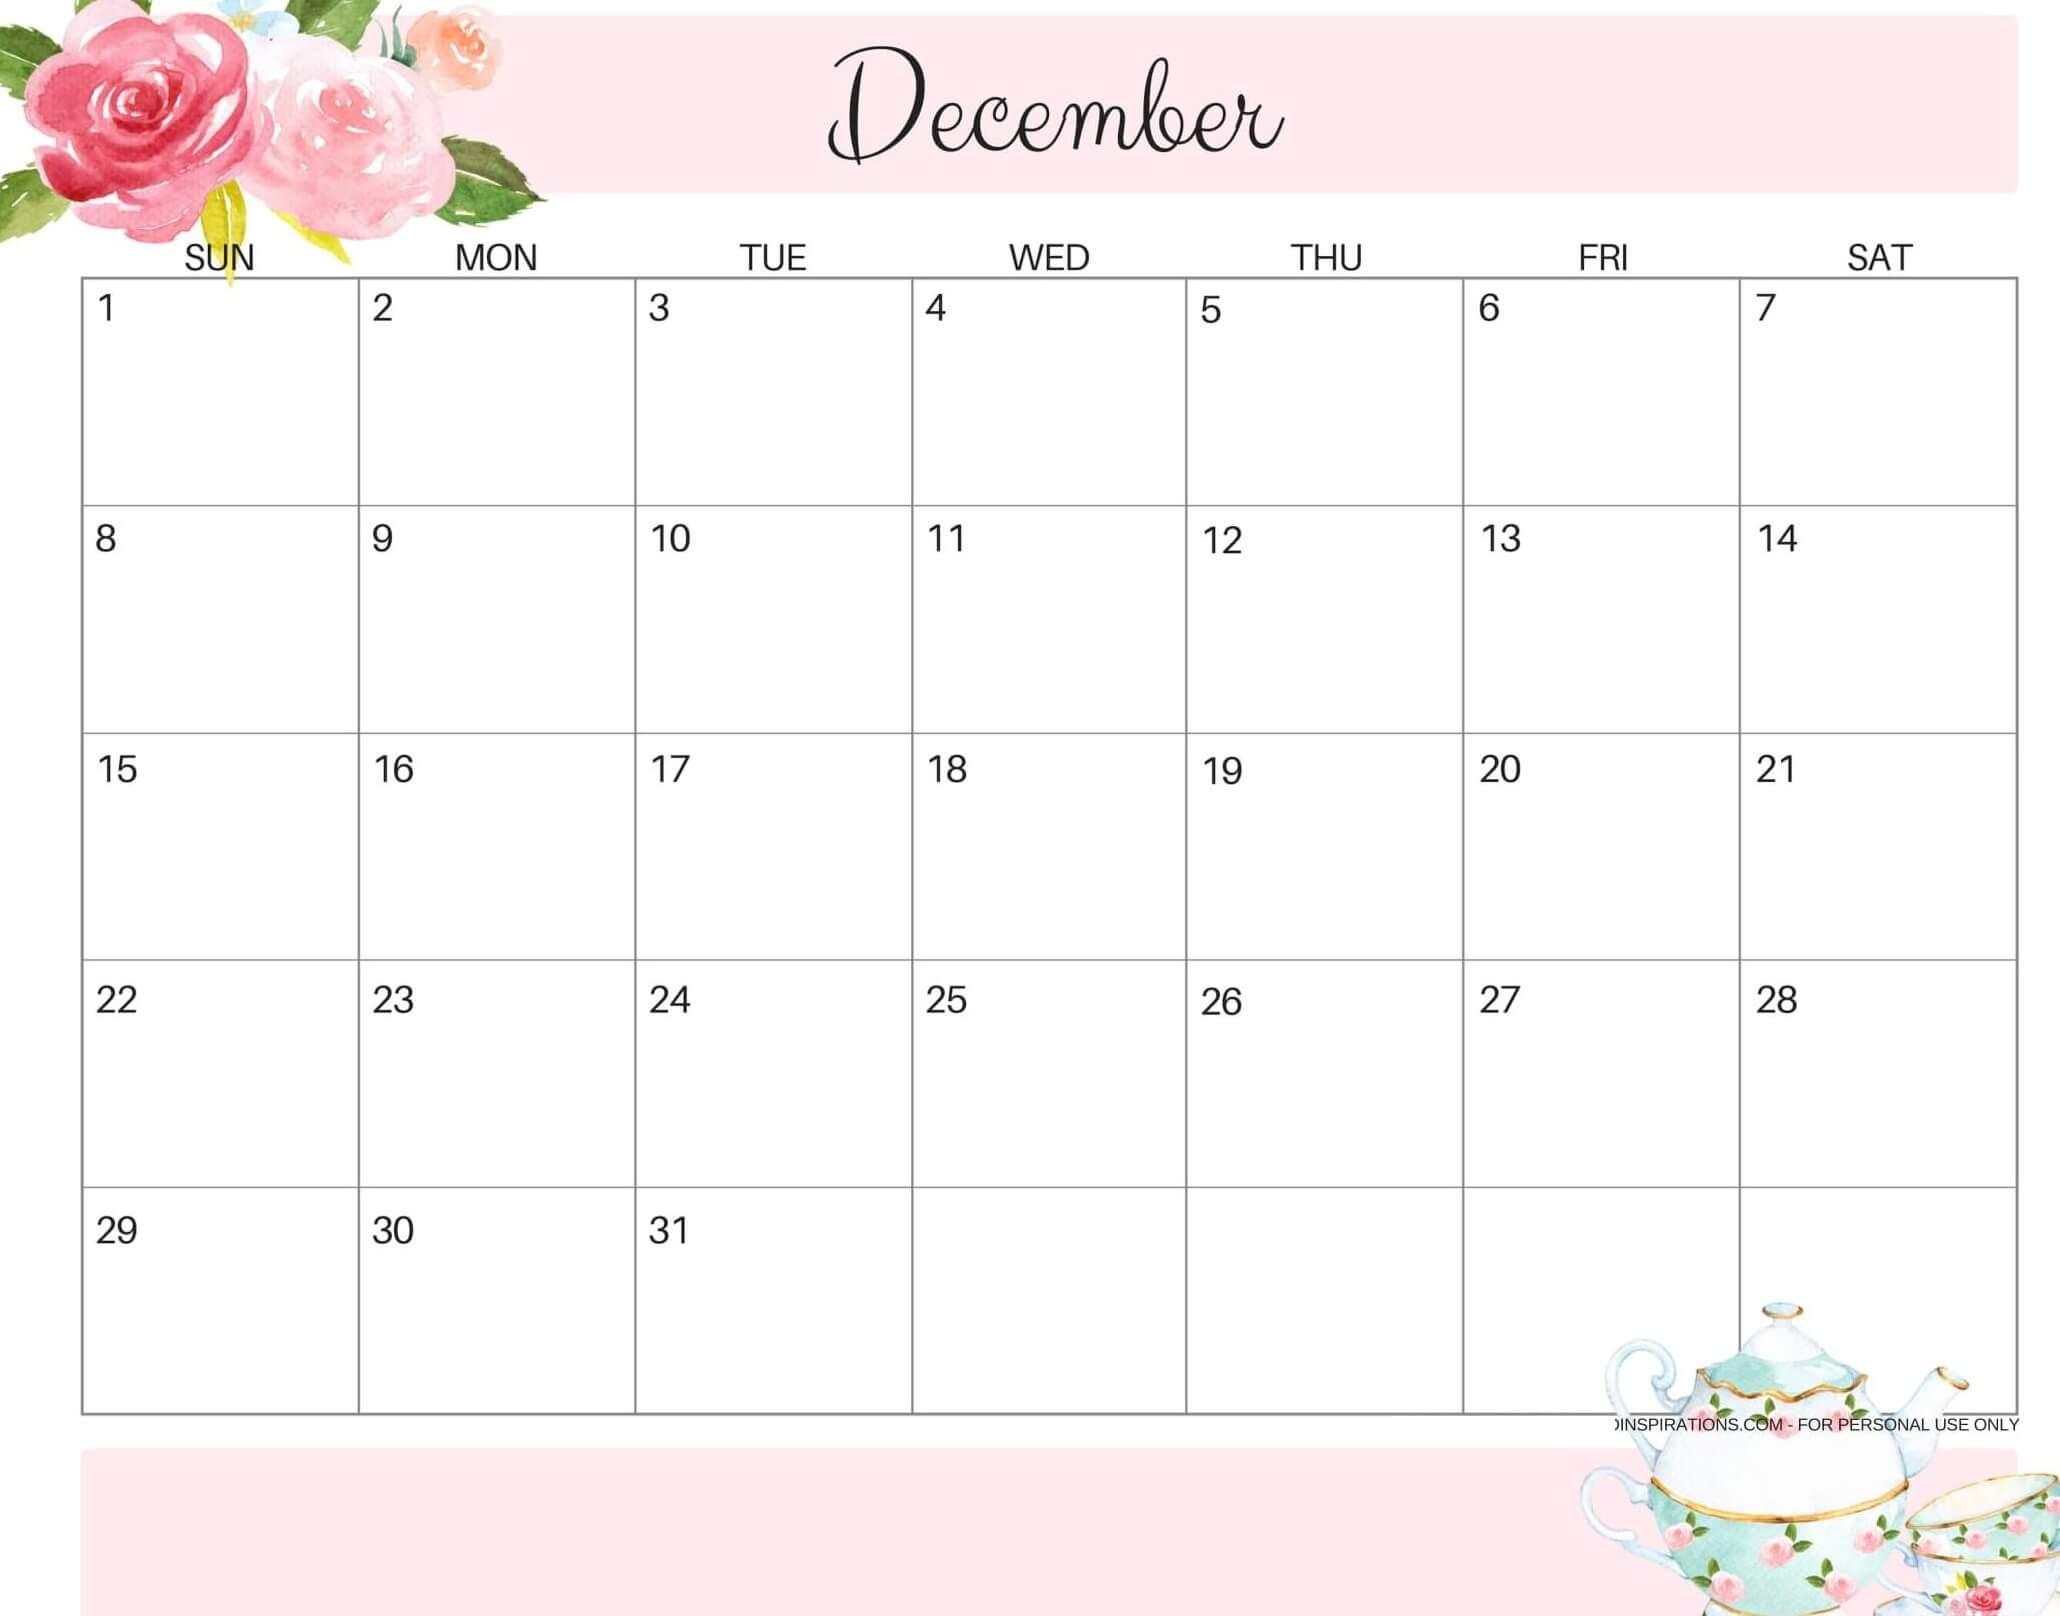 Printable Cute December 2019 Calendar Images - Set Your Plan